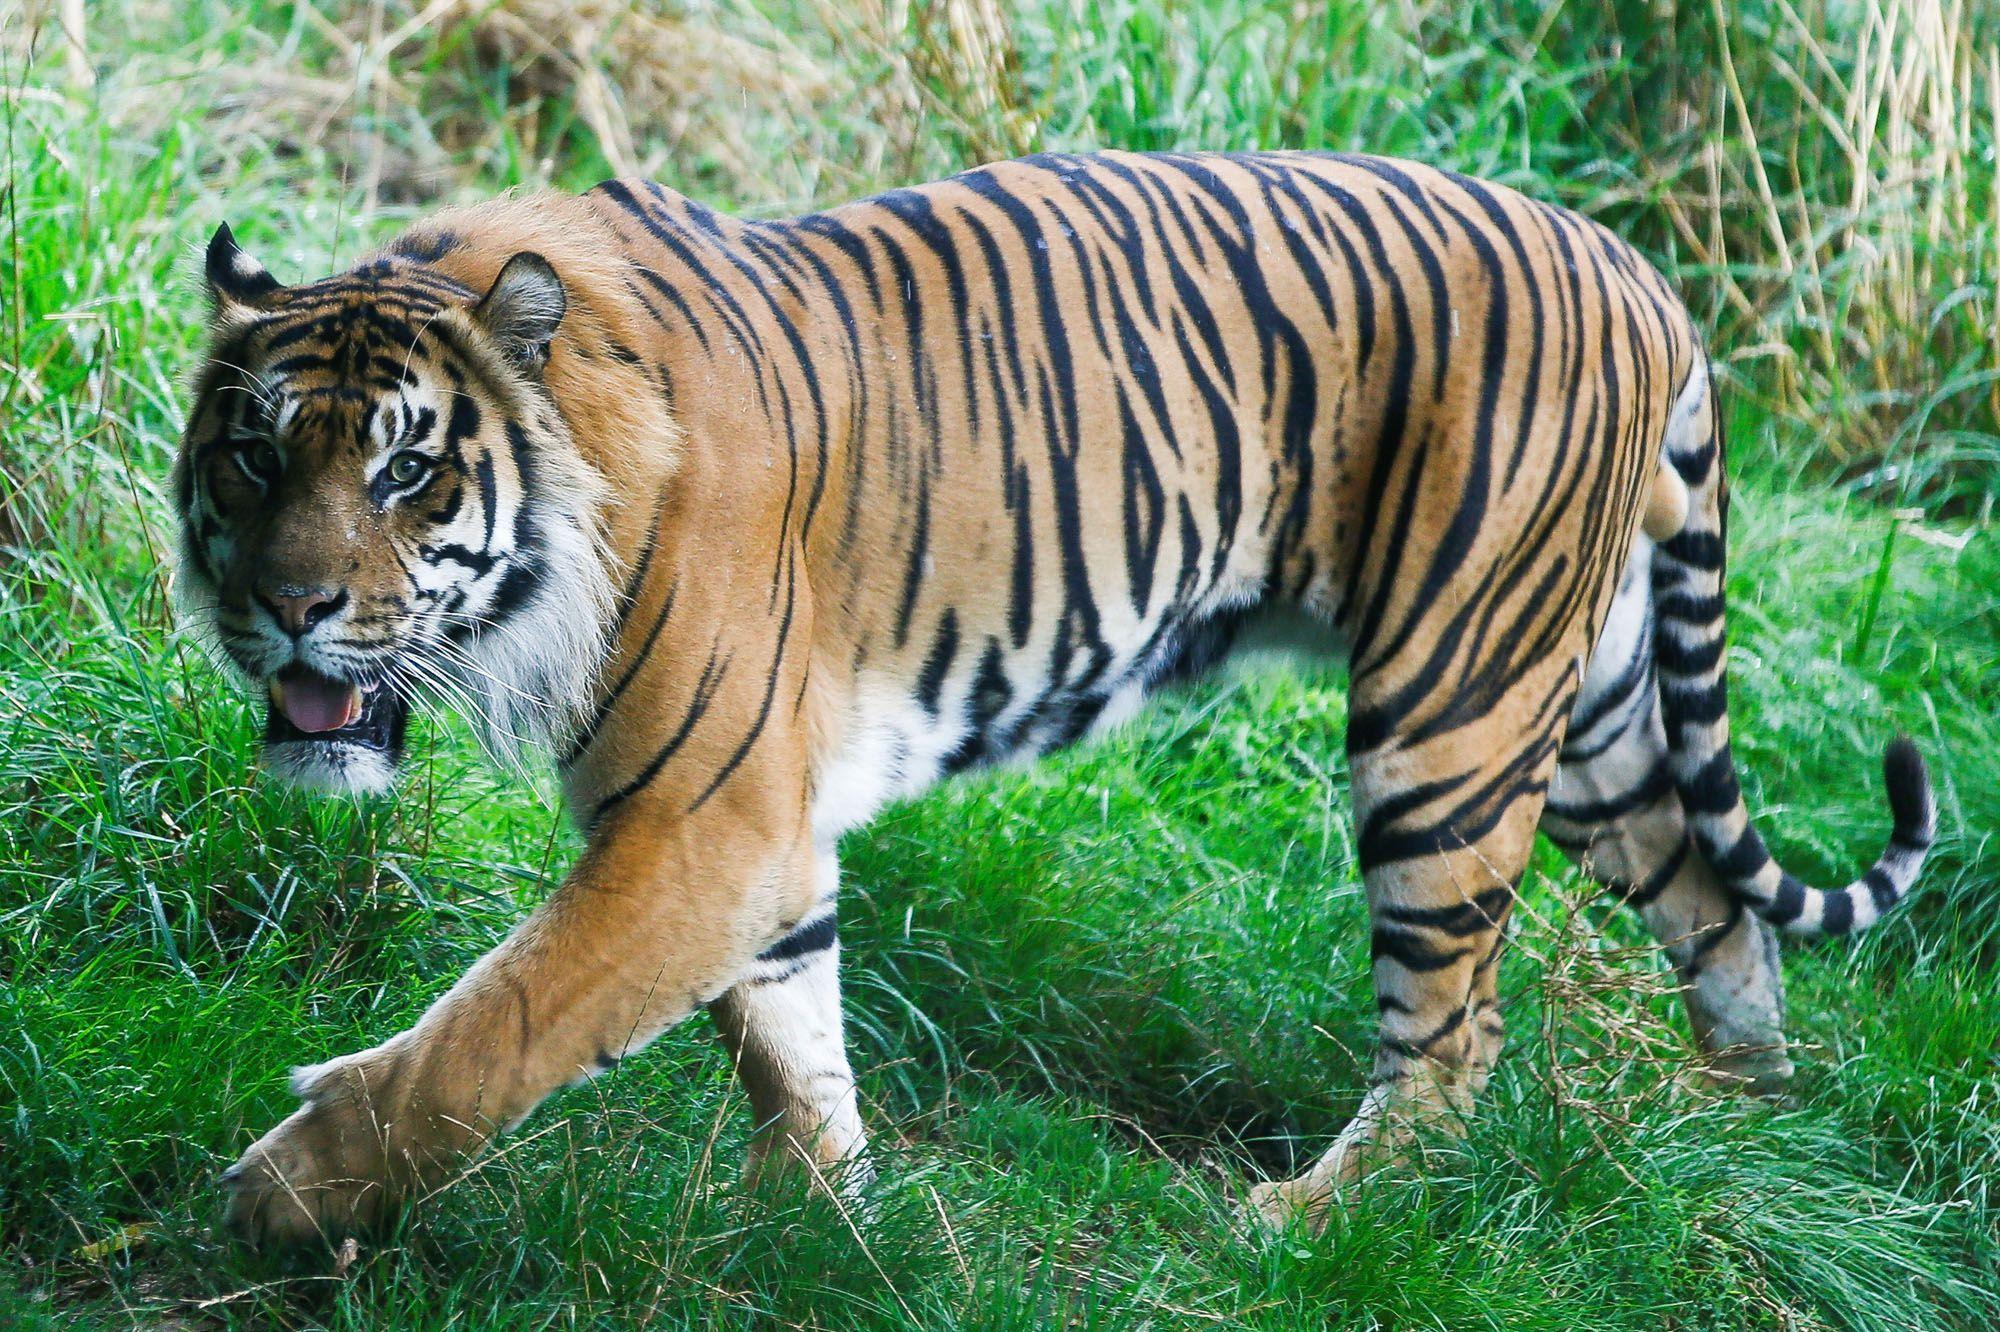 Indonesie Un Tigre De Sumatra Tue Un Agriculteur